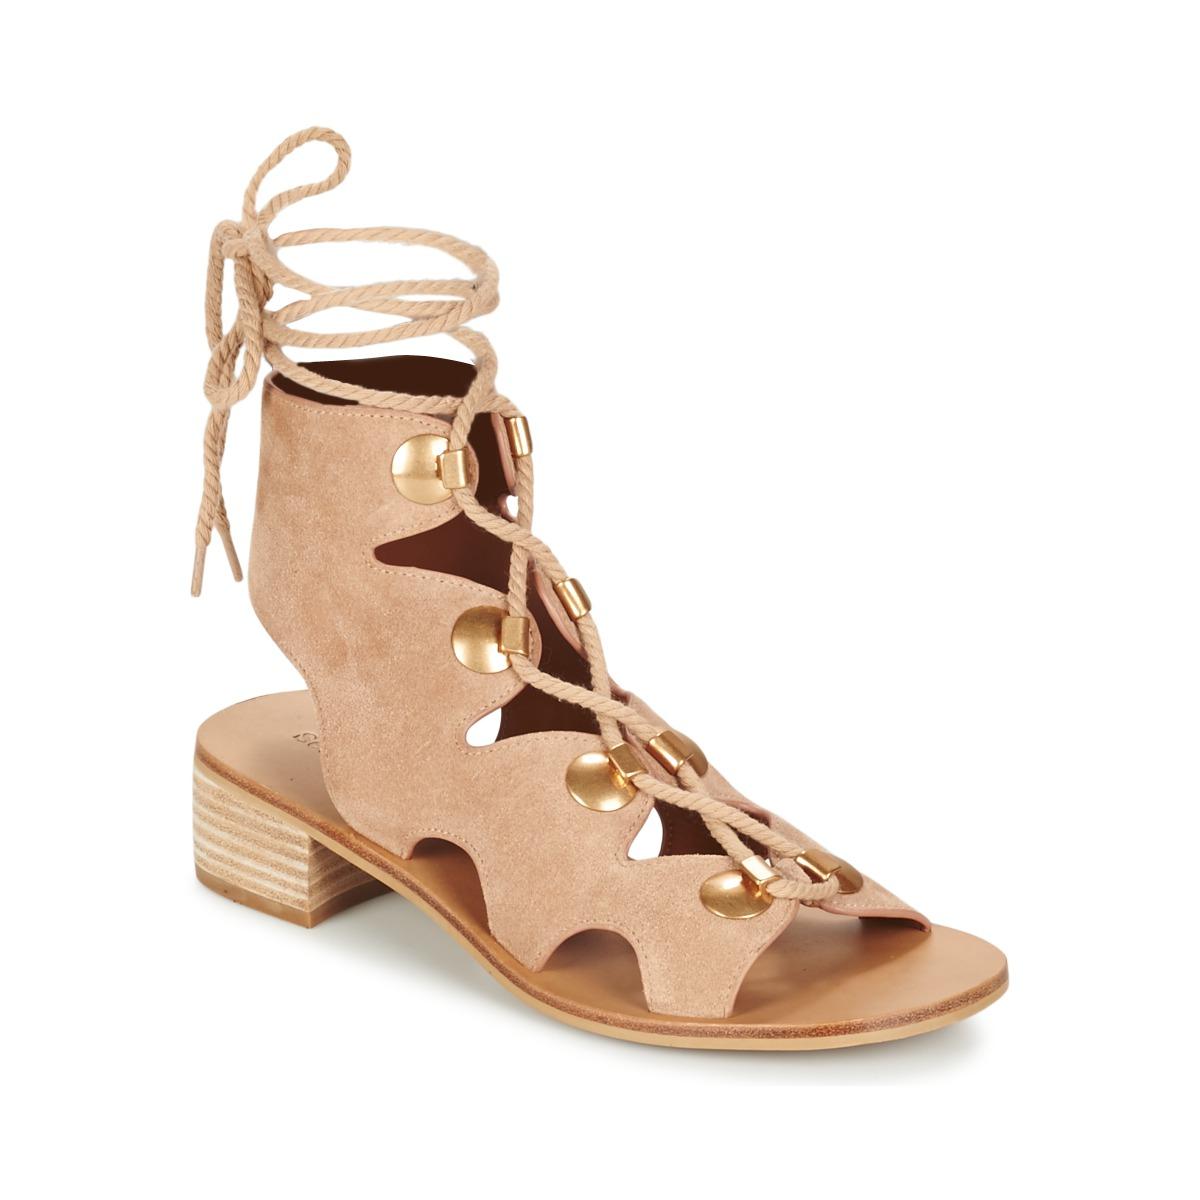 see by chlo sb28231 beige gratis levering bij schoenen sandalen dames 335 00. Black Bedroom Furniture Sets. Home Design Ideas